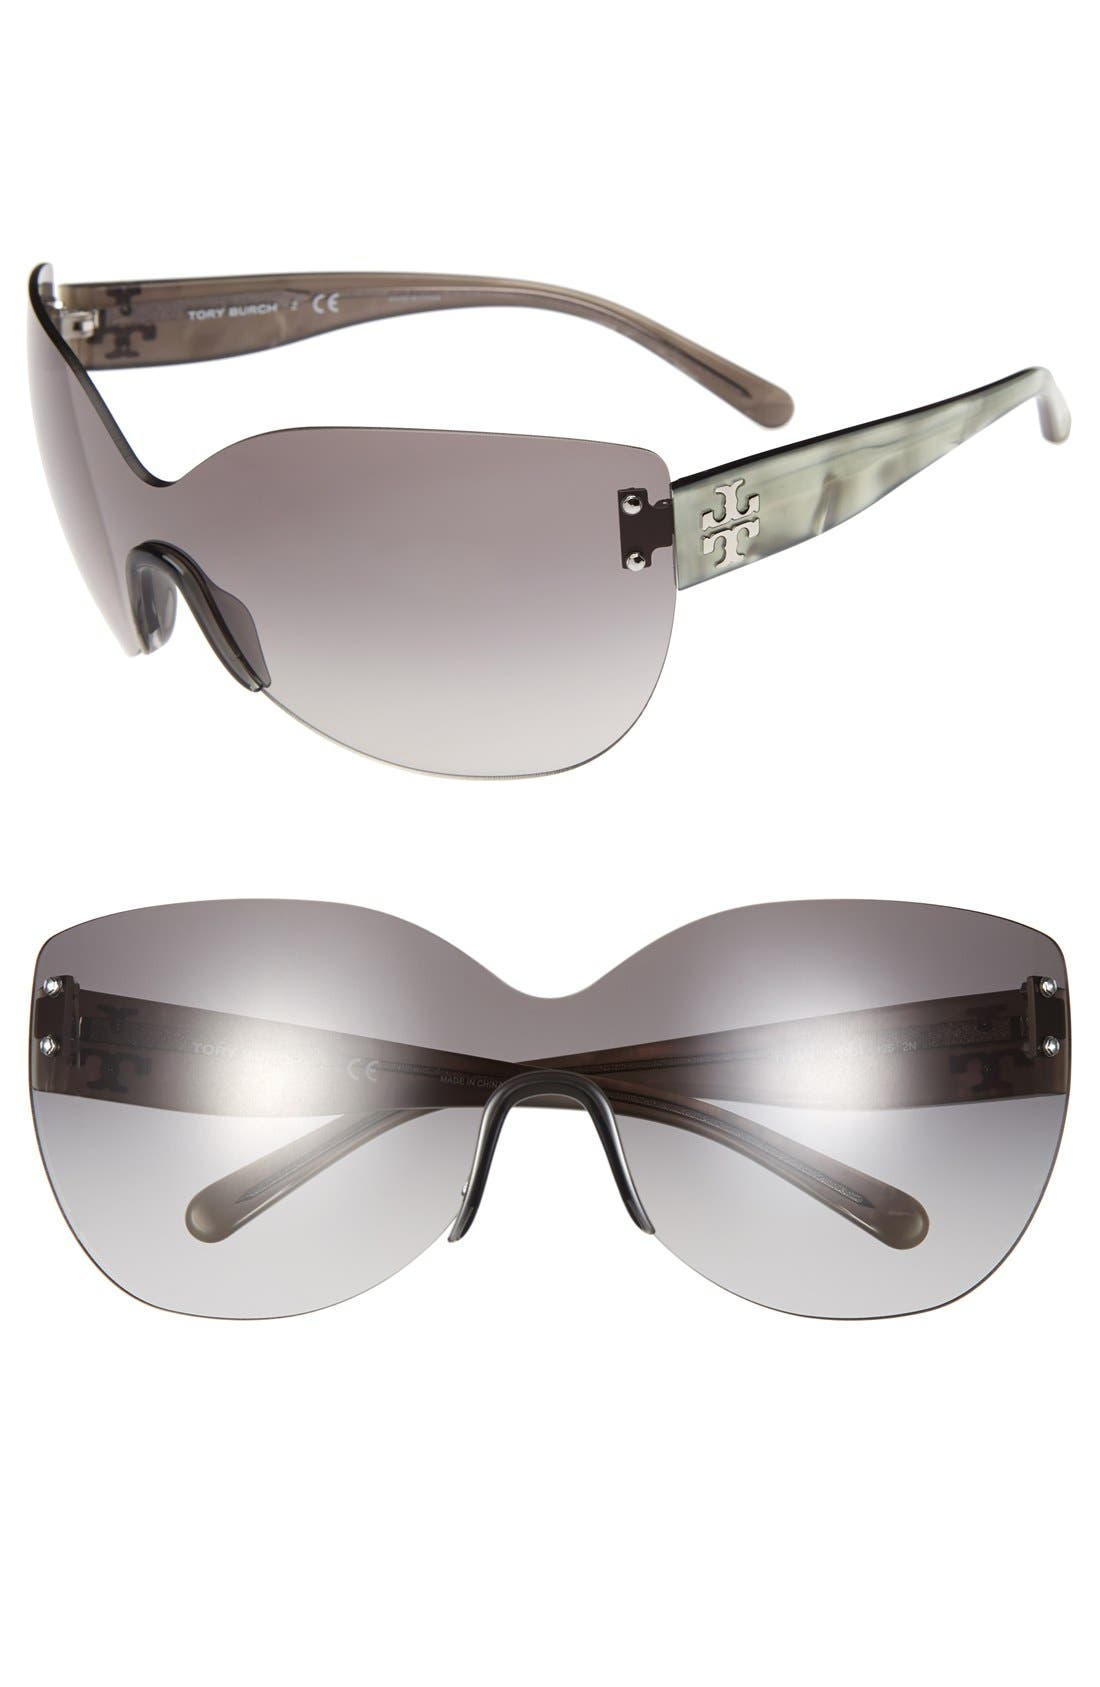 Alternate Image 1 Selected - Tory Burch 'Pilot' 70mm Wrap Sunglasses